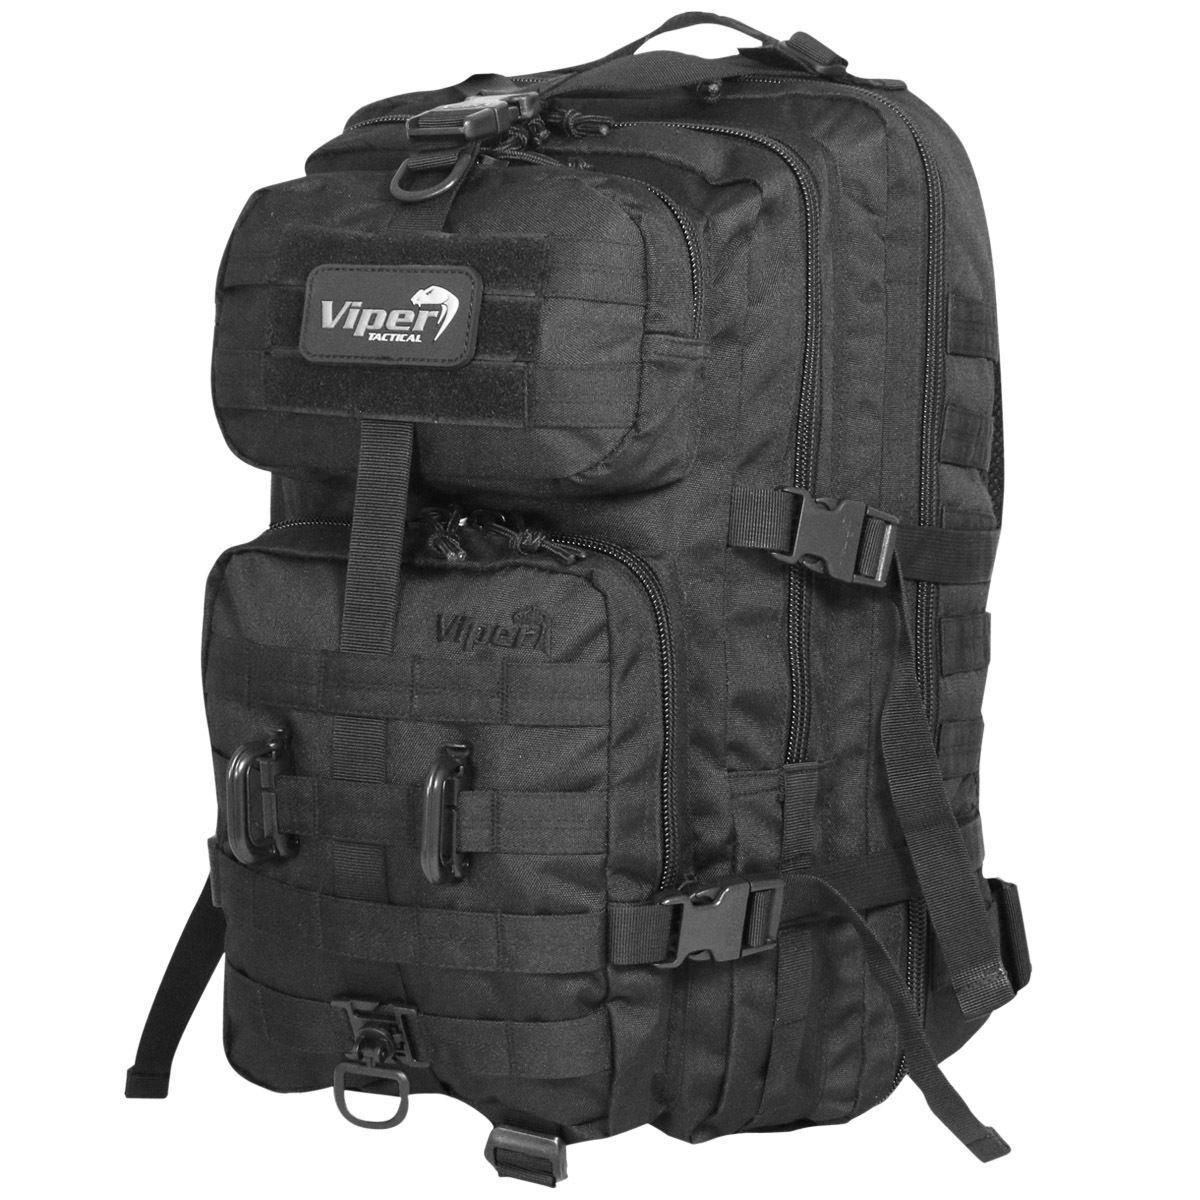 Viper Recon extra RUCKSACK Pack kompakt Molle Armee Trinksystem-Rucksack 20L